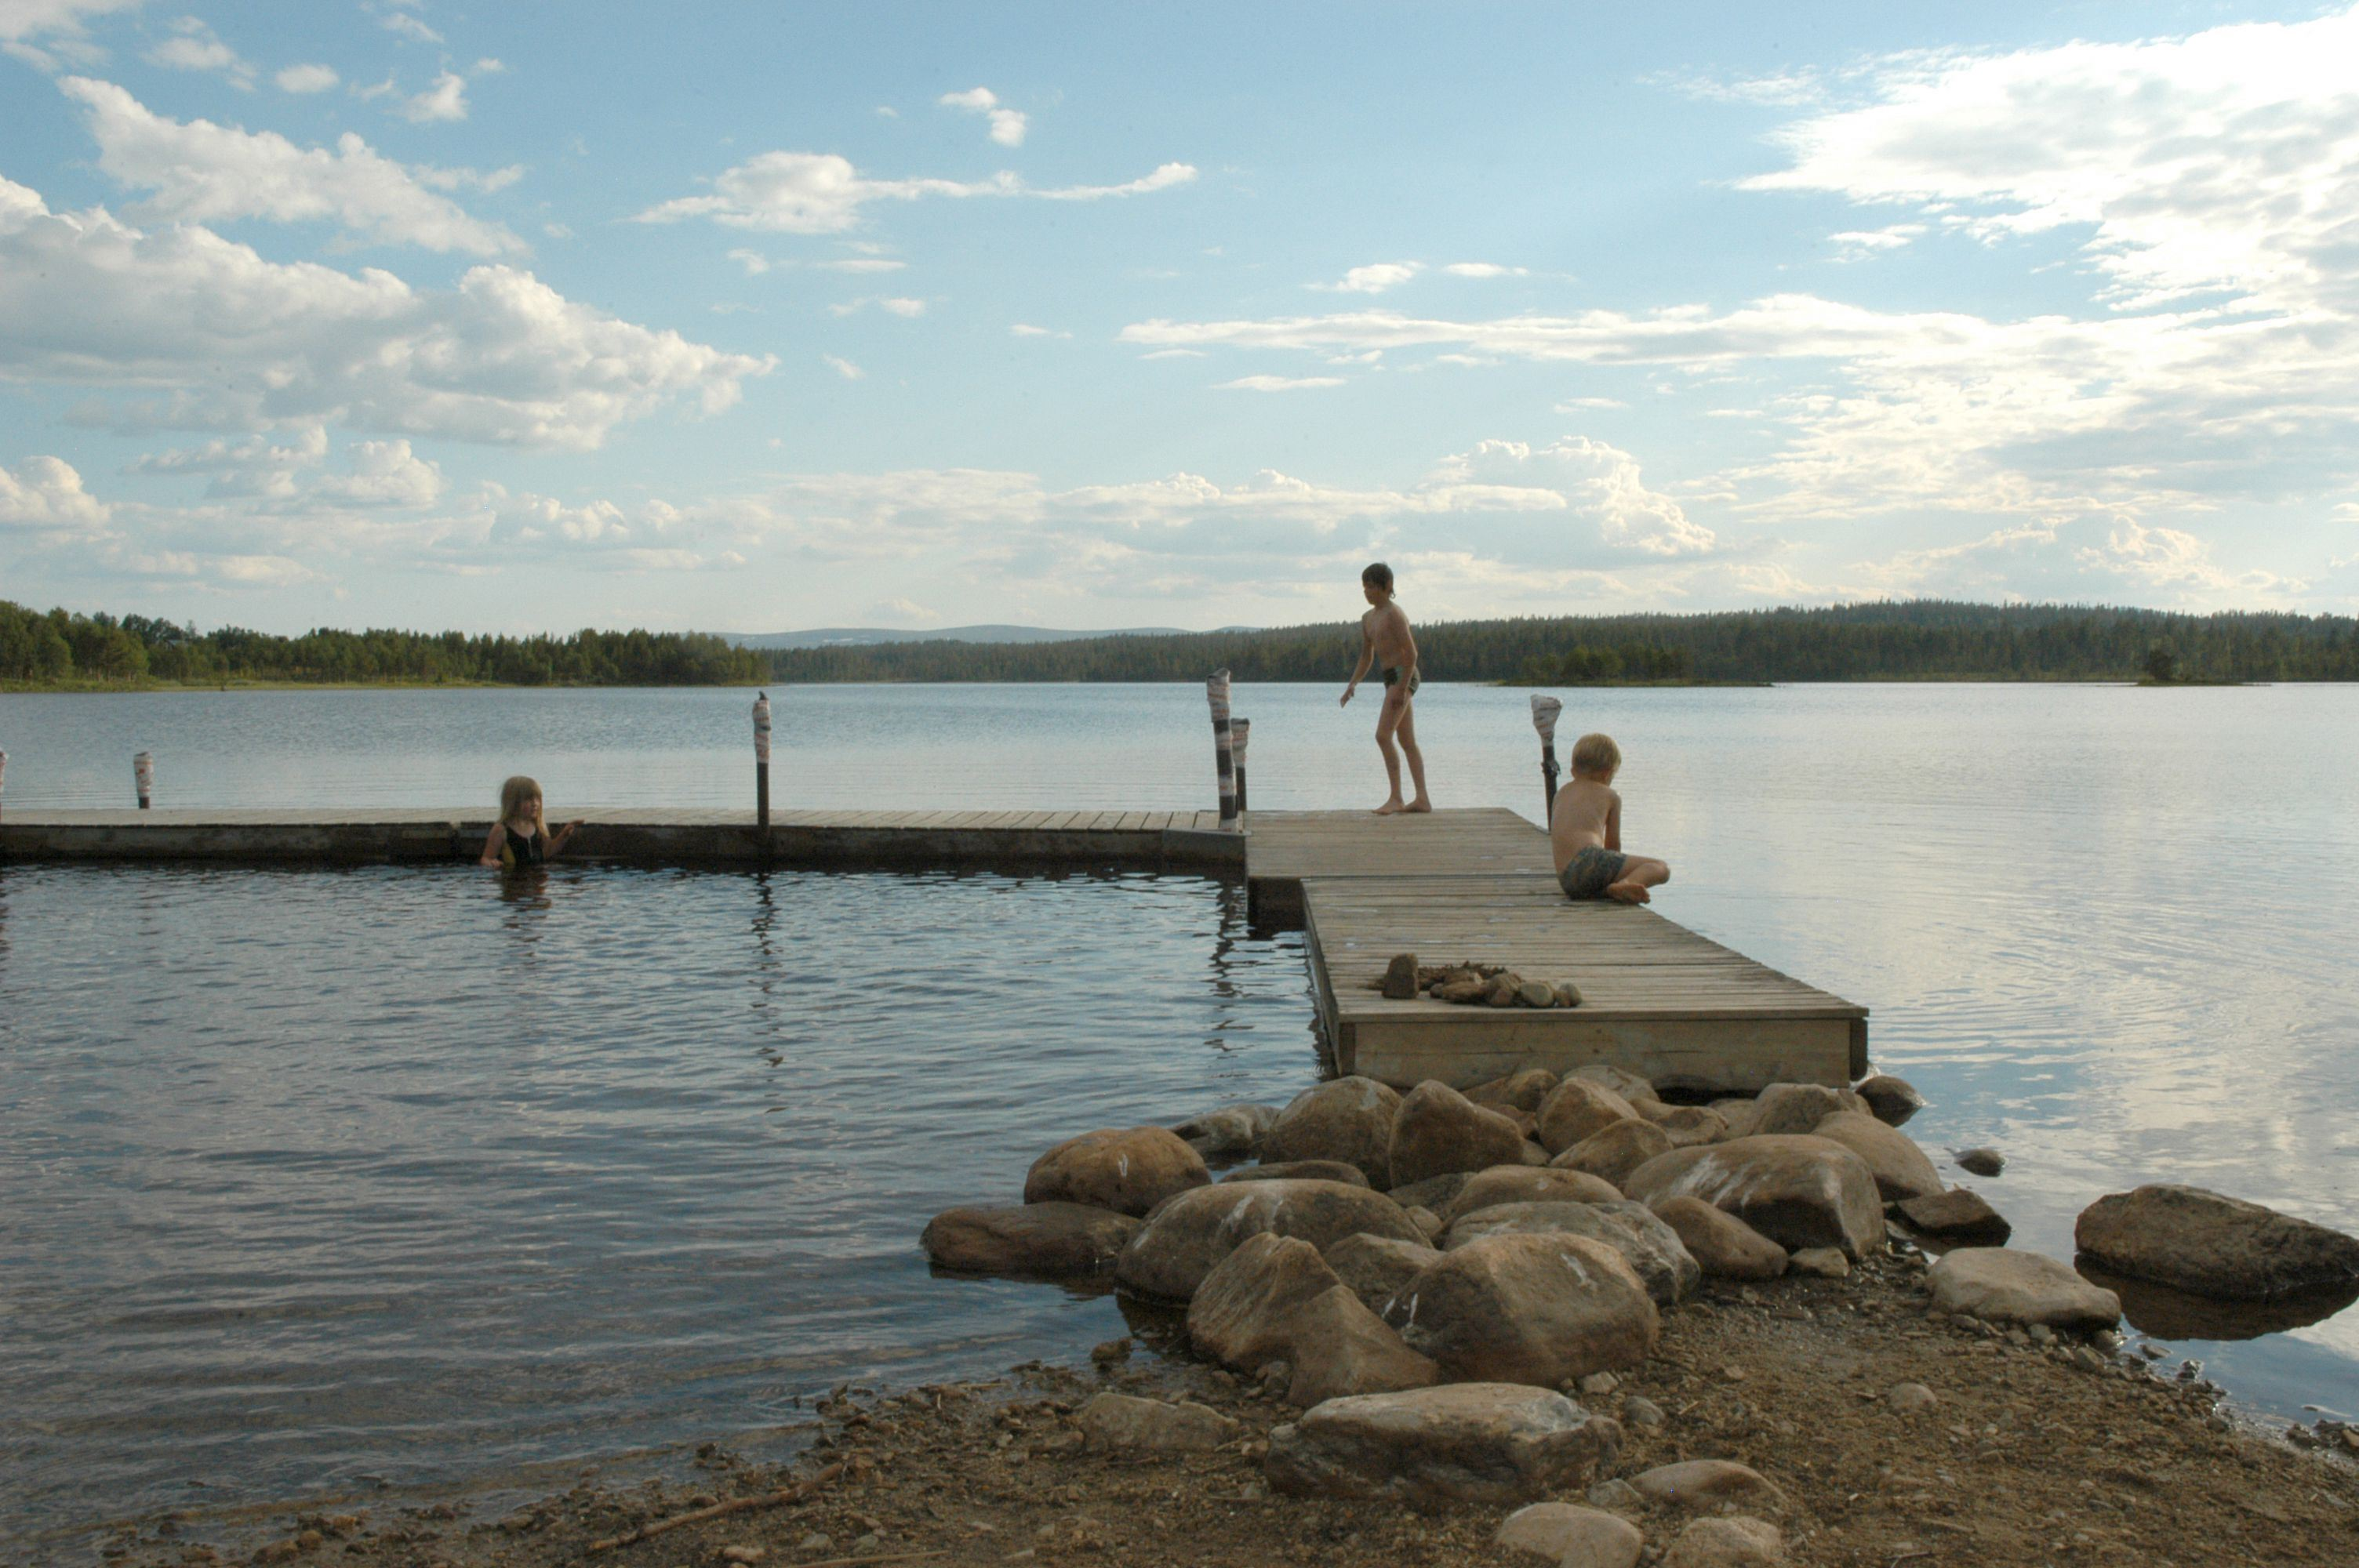 Nisse Schmidt, Drevdagens badplats